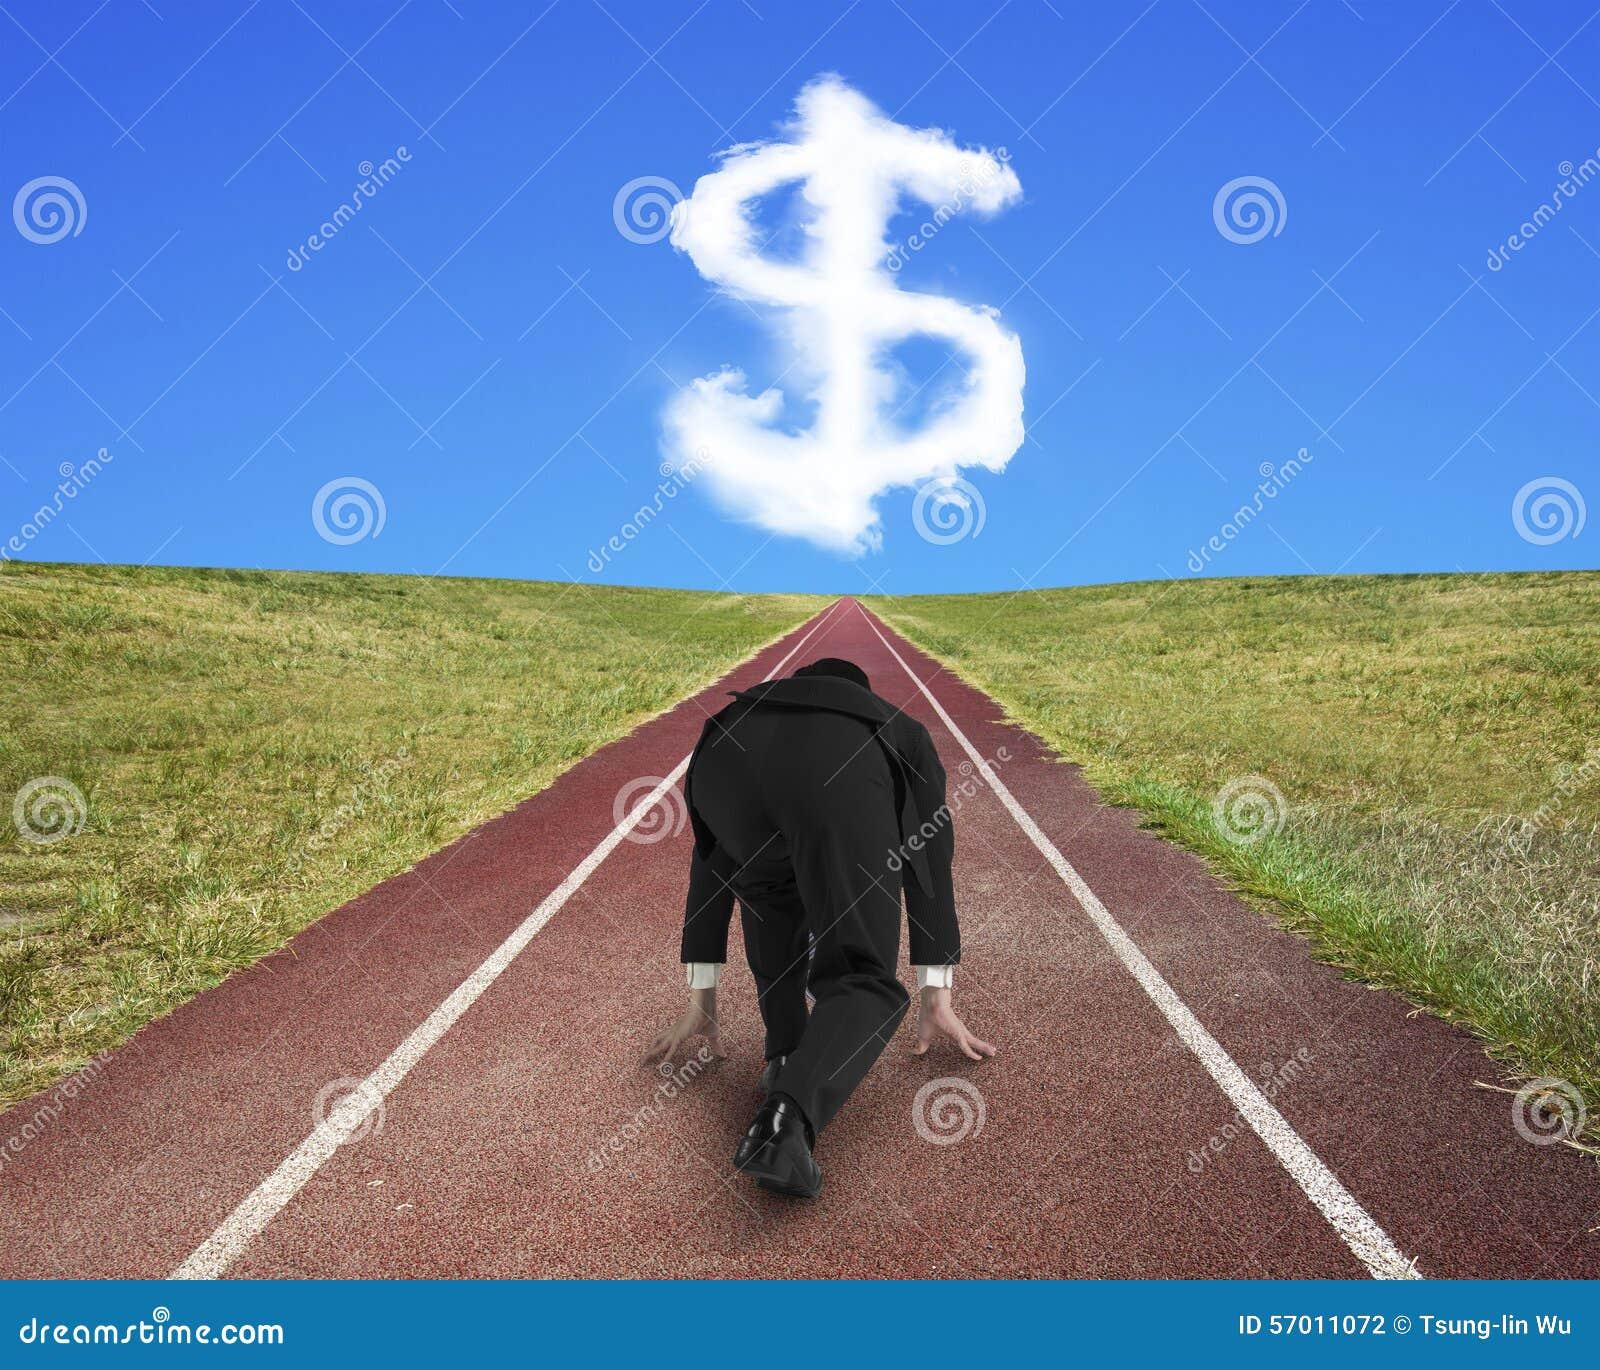 Businessman ready to race on running track toward dollar sign